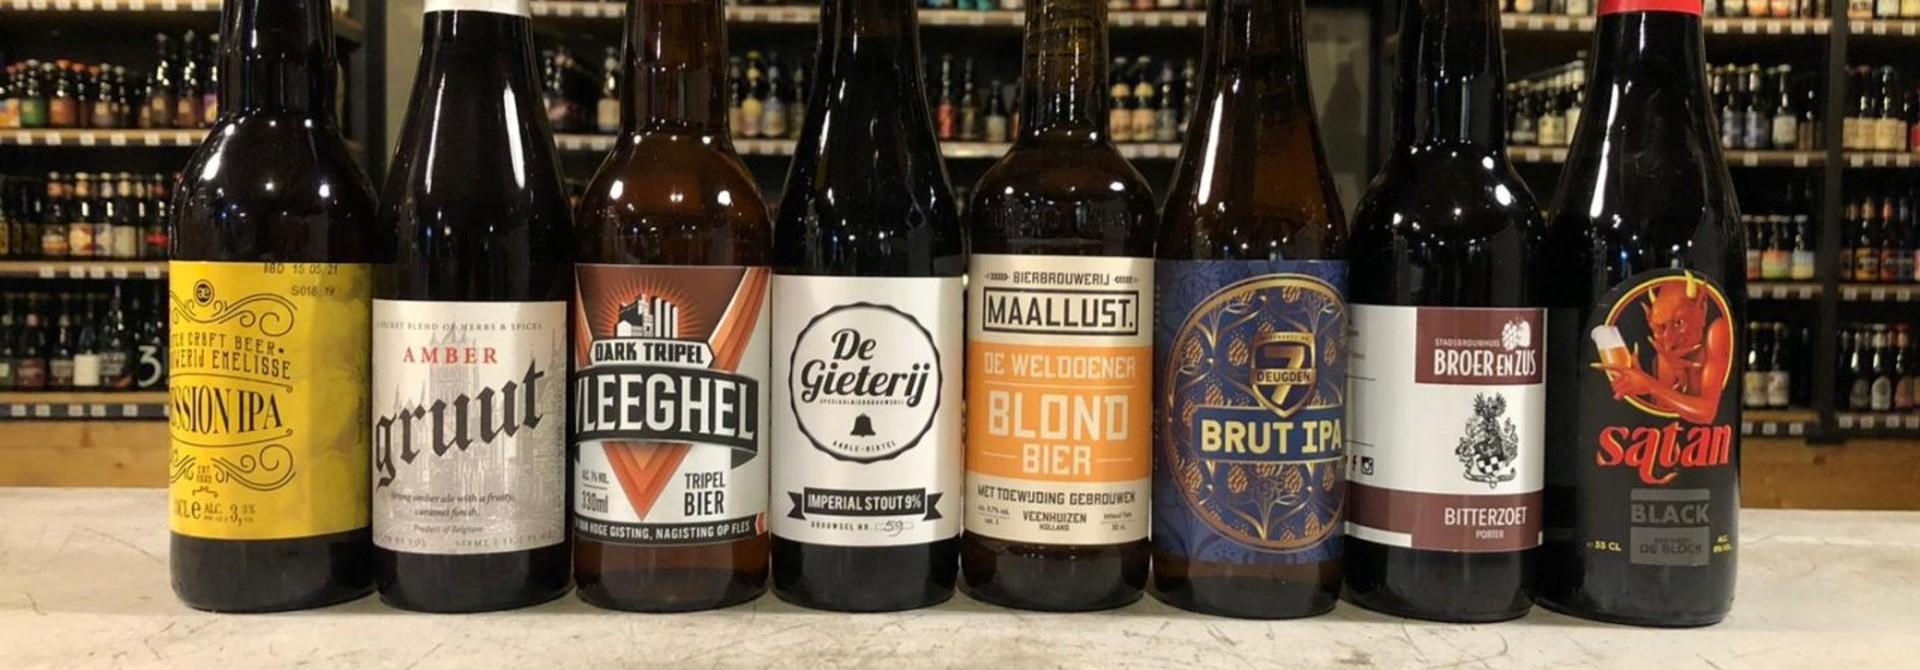 Speciaalbier – bierpakket februari 2021